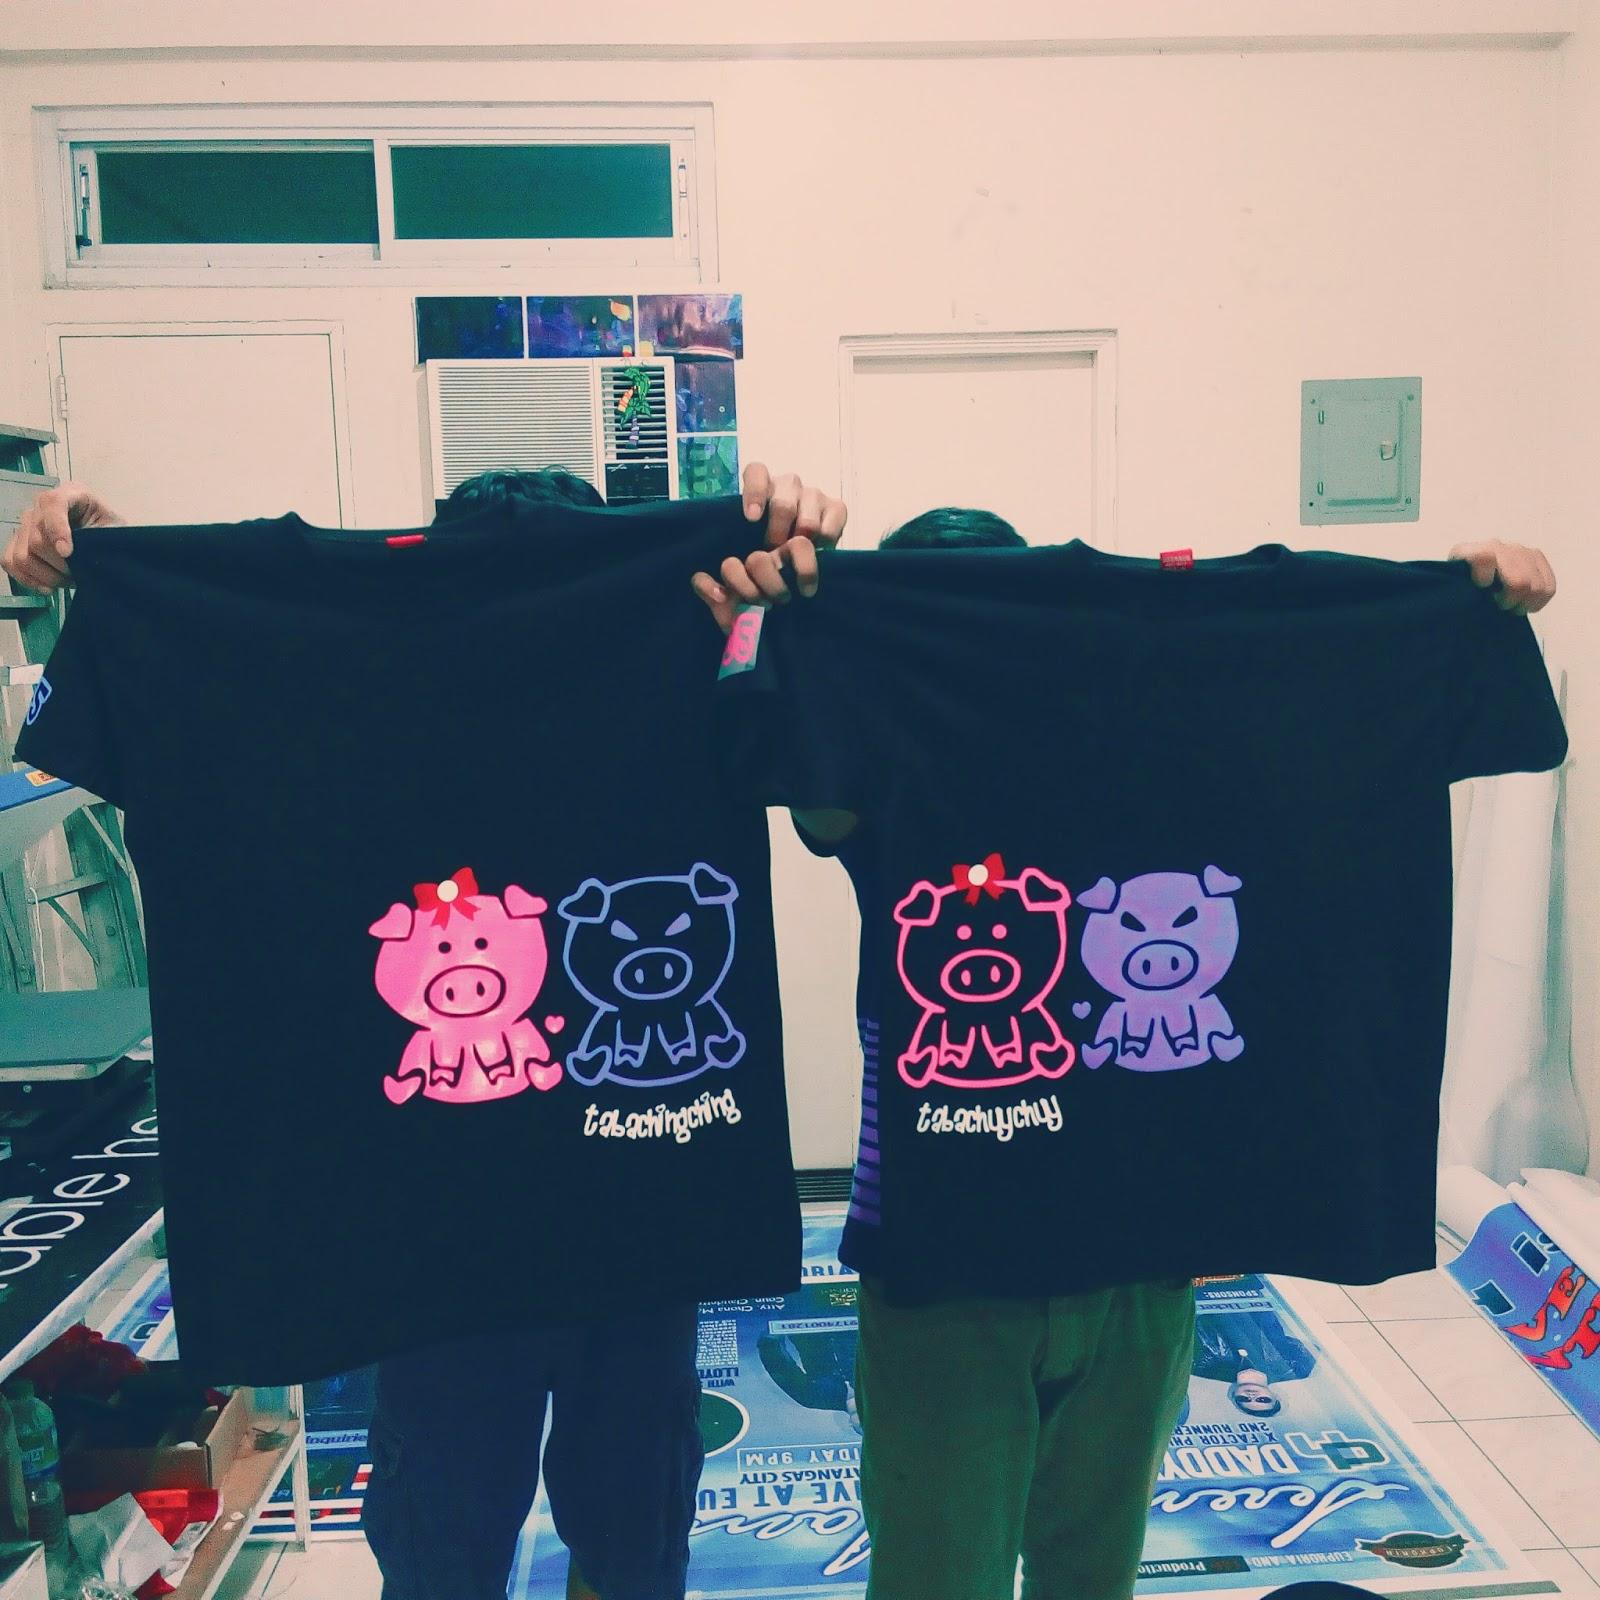 Stain art designs and prints couple shirt batangas city couple shirt cheap couple shirt batangas cute couple shirt stopboris Choice Image